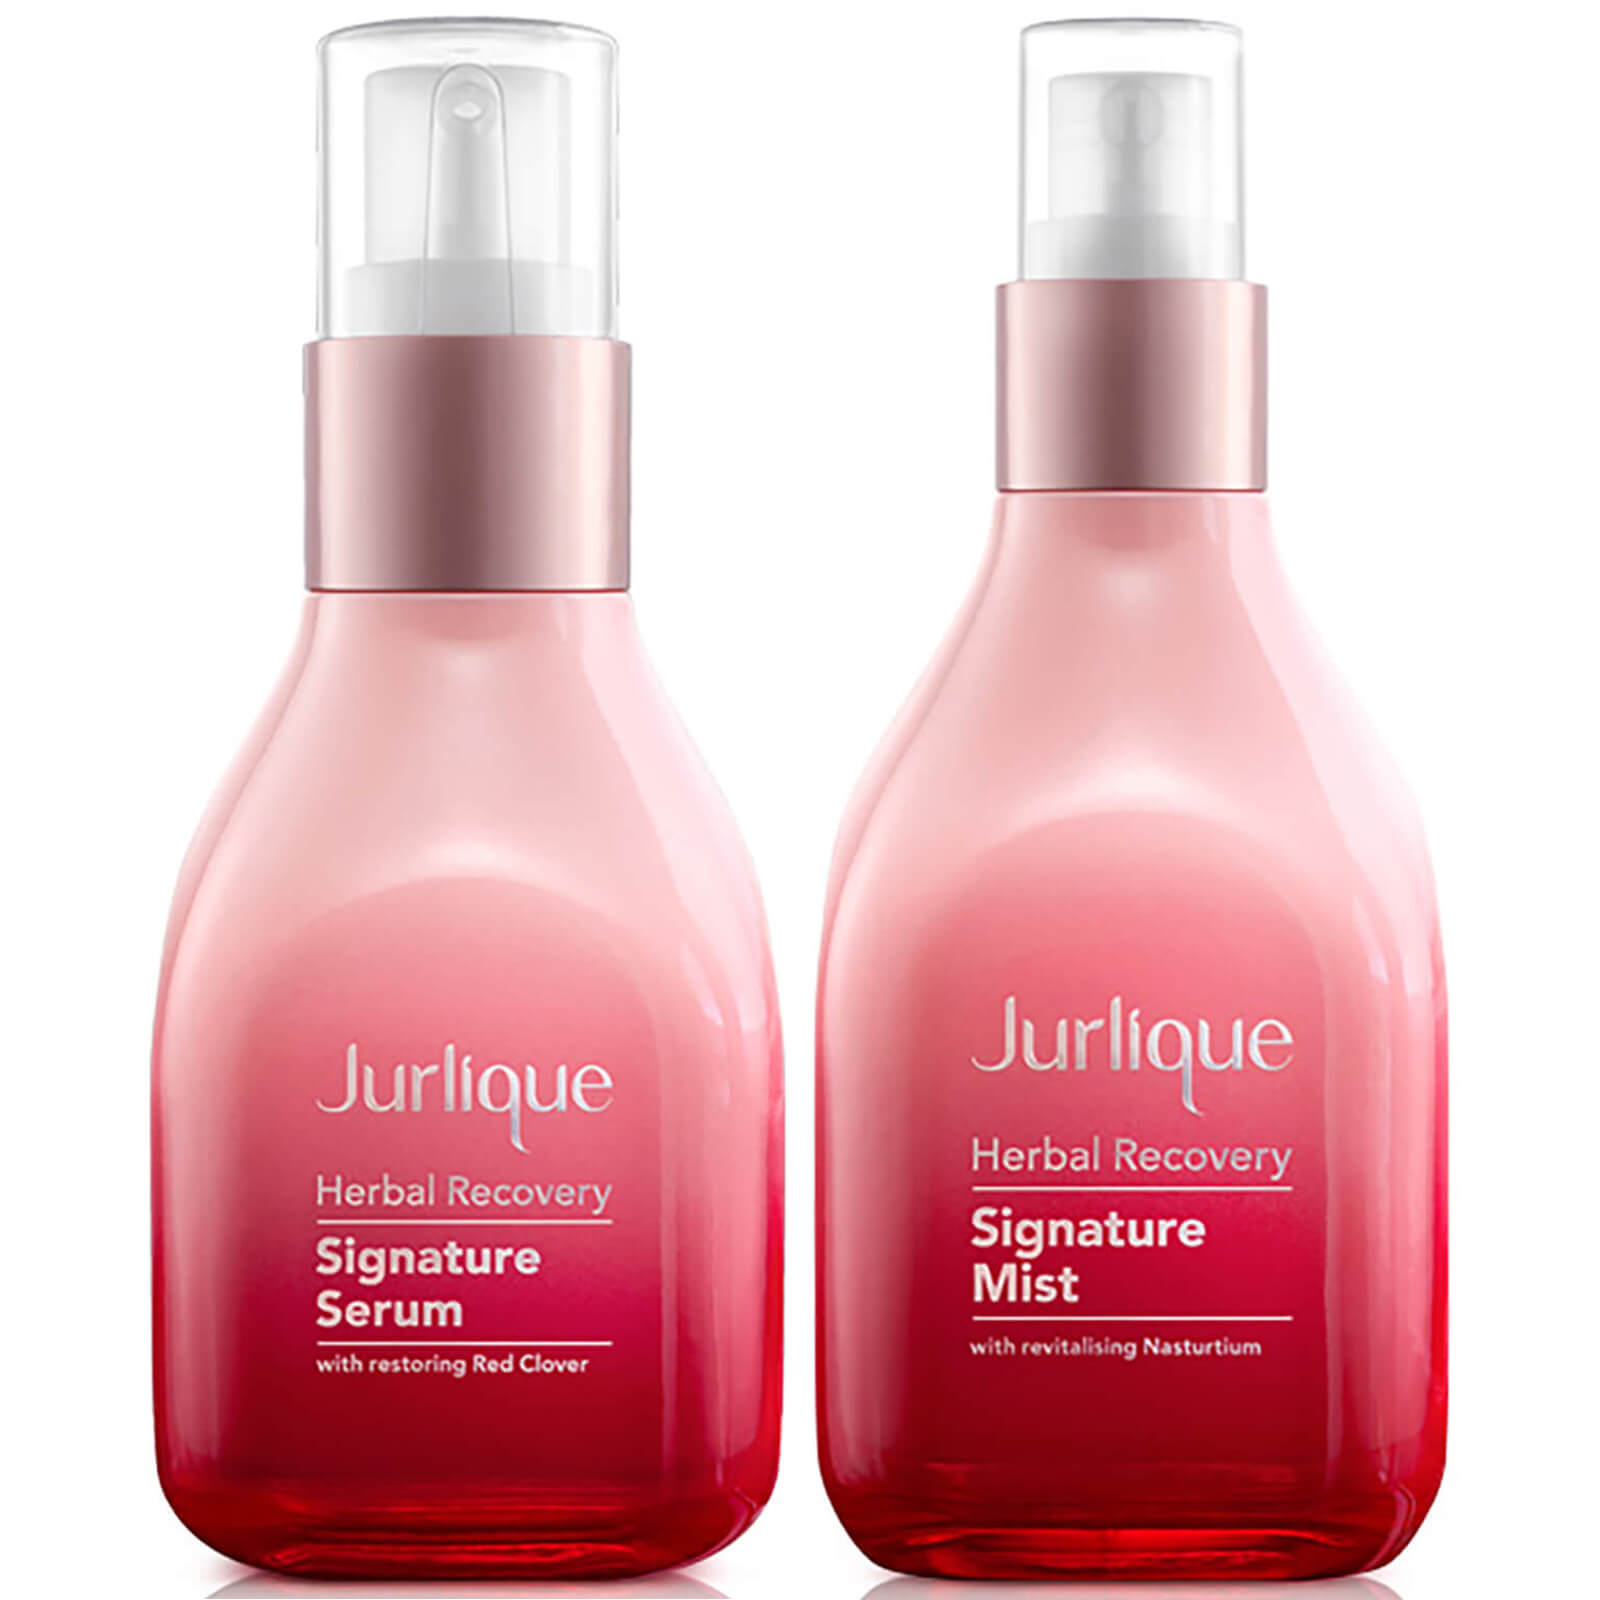 jurlique radiance bundle (worth £121.00)